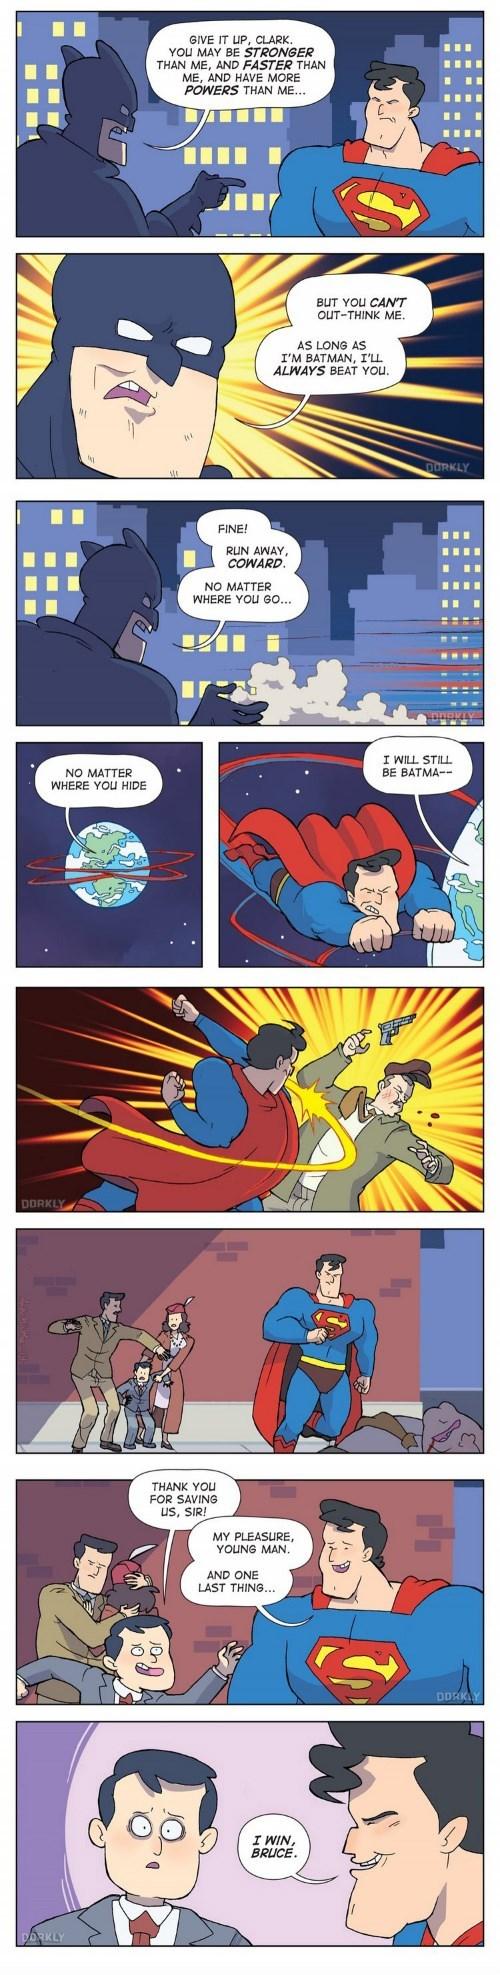 Batman v Superman time travel web comics - 8276267008